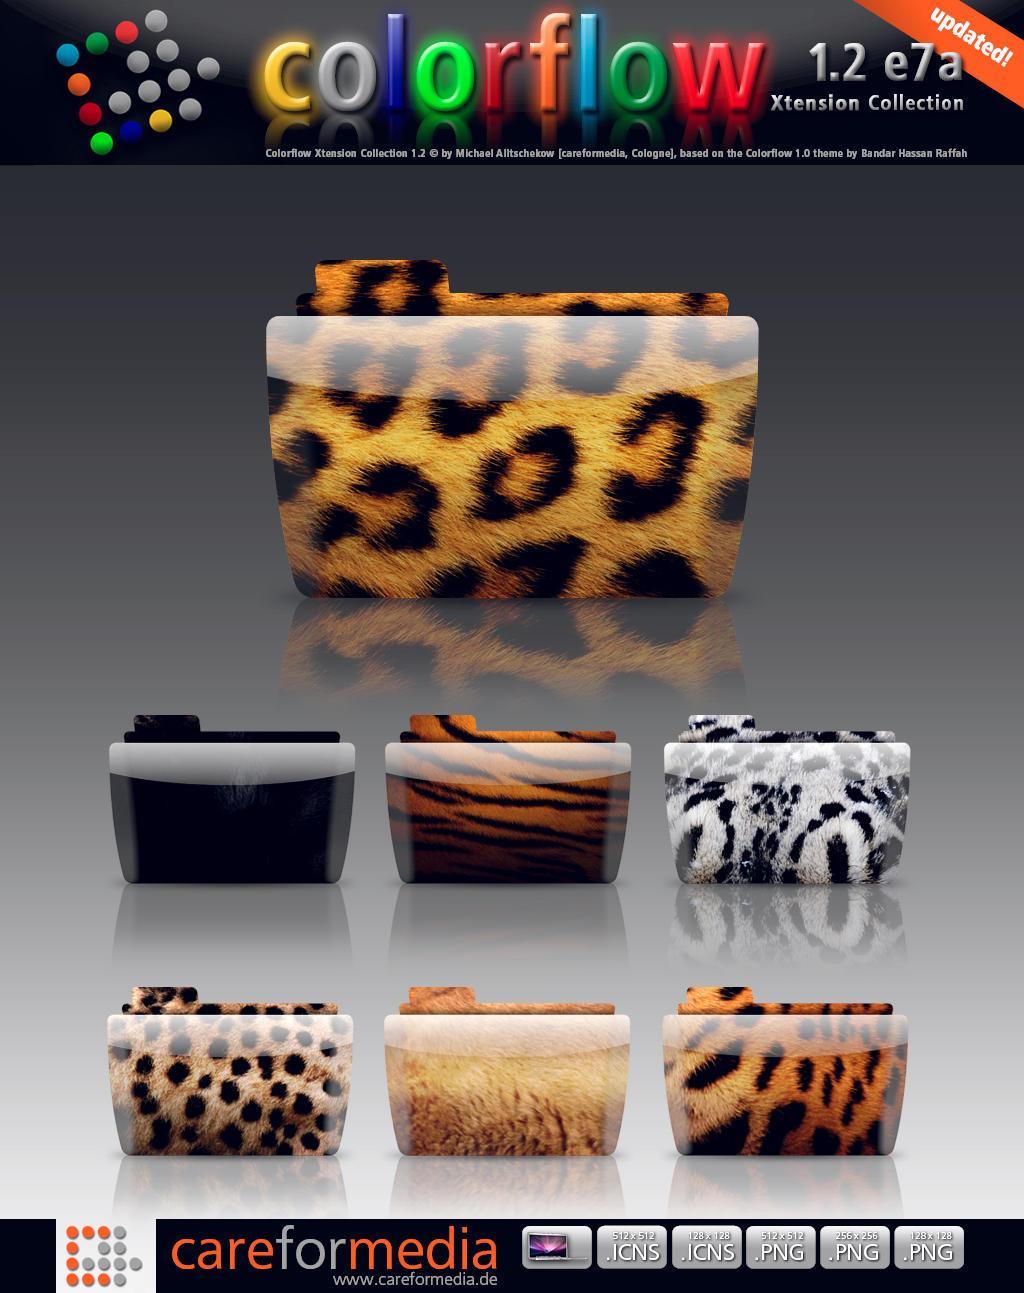 Colorflow 1.2 e7a Animals by subuddha